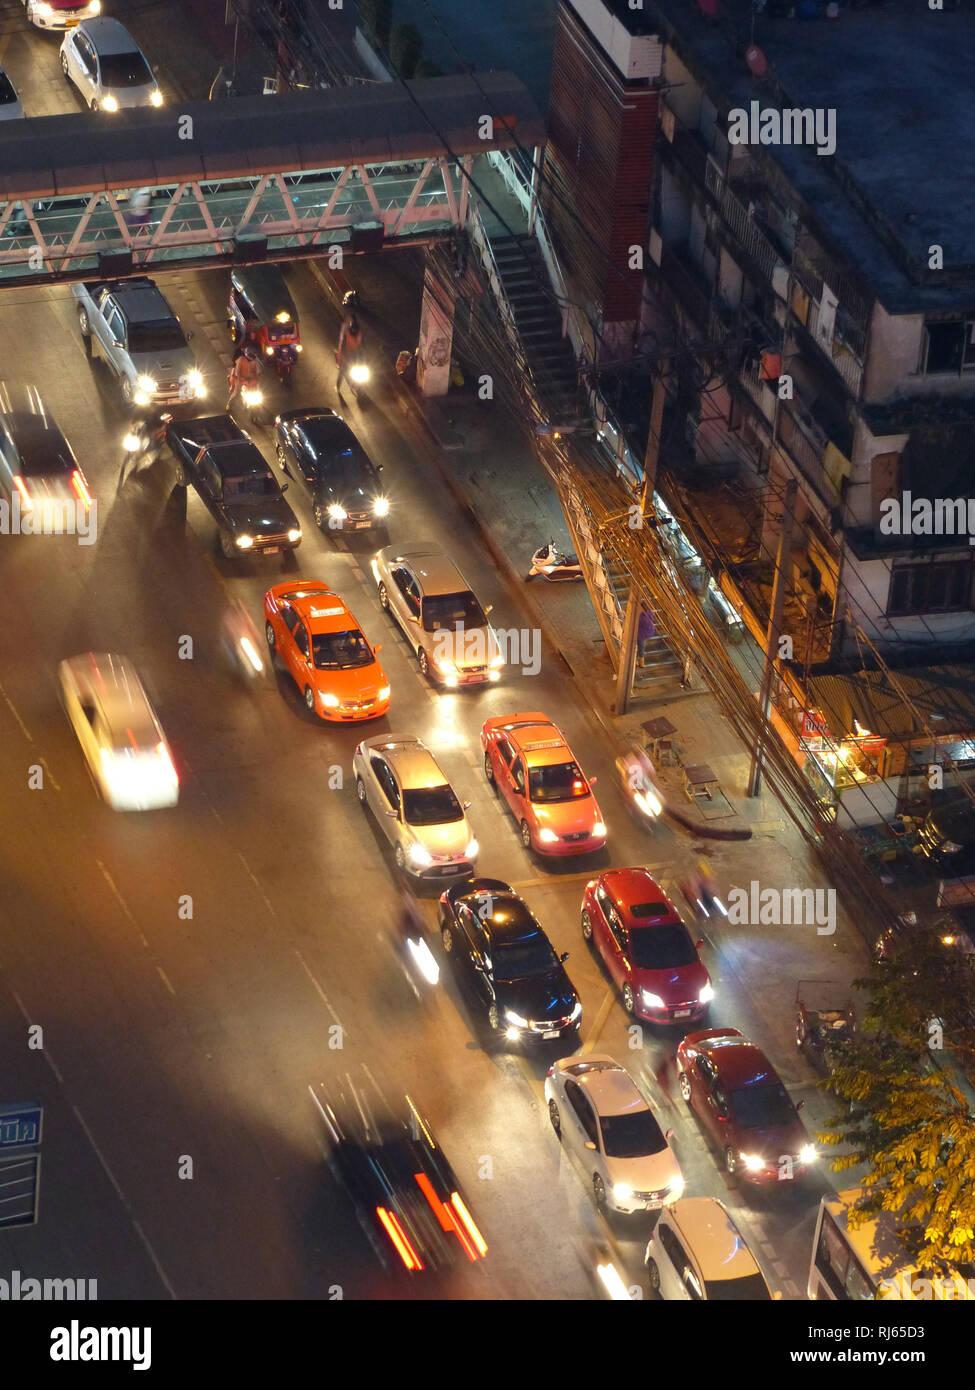 Night traffic jam in Bangkok, taxicabs - Stock Image